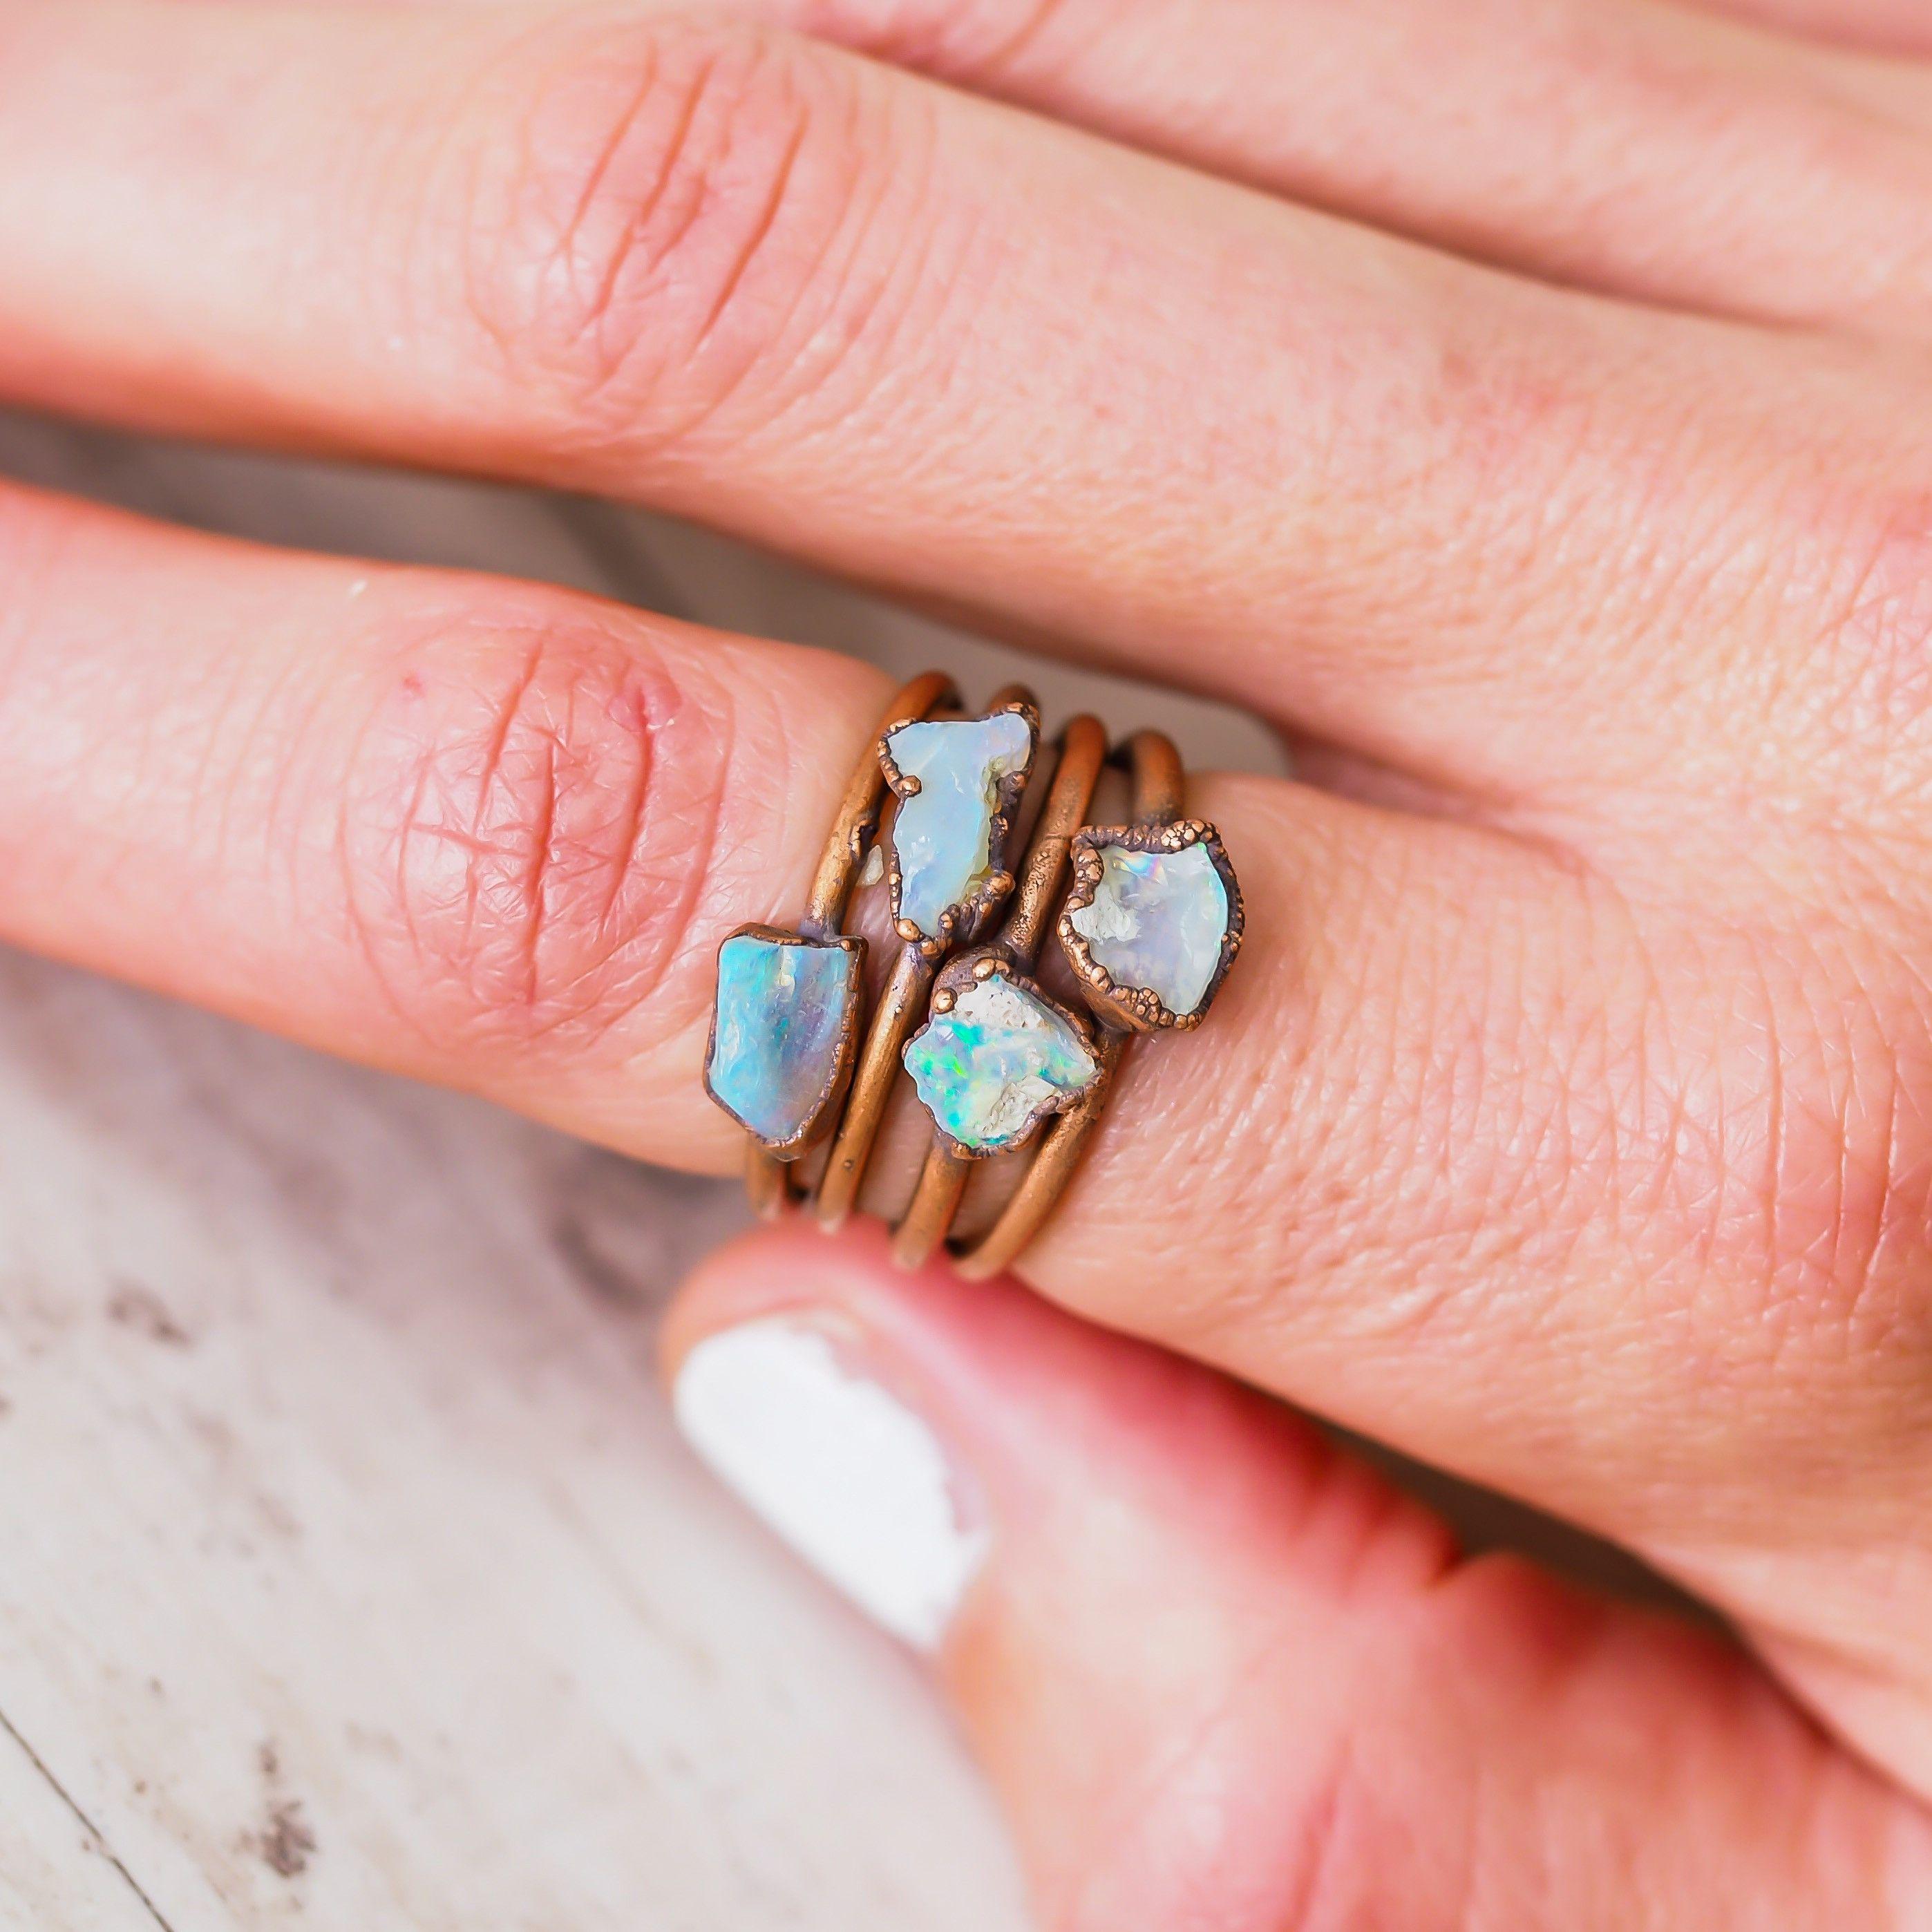 Australian Raw Opal and Copper Ring | リング | Pinterest | Raw opal ...